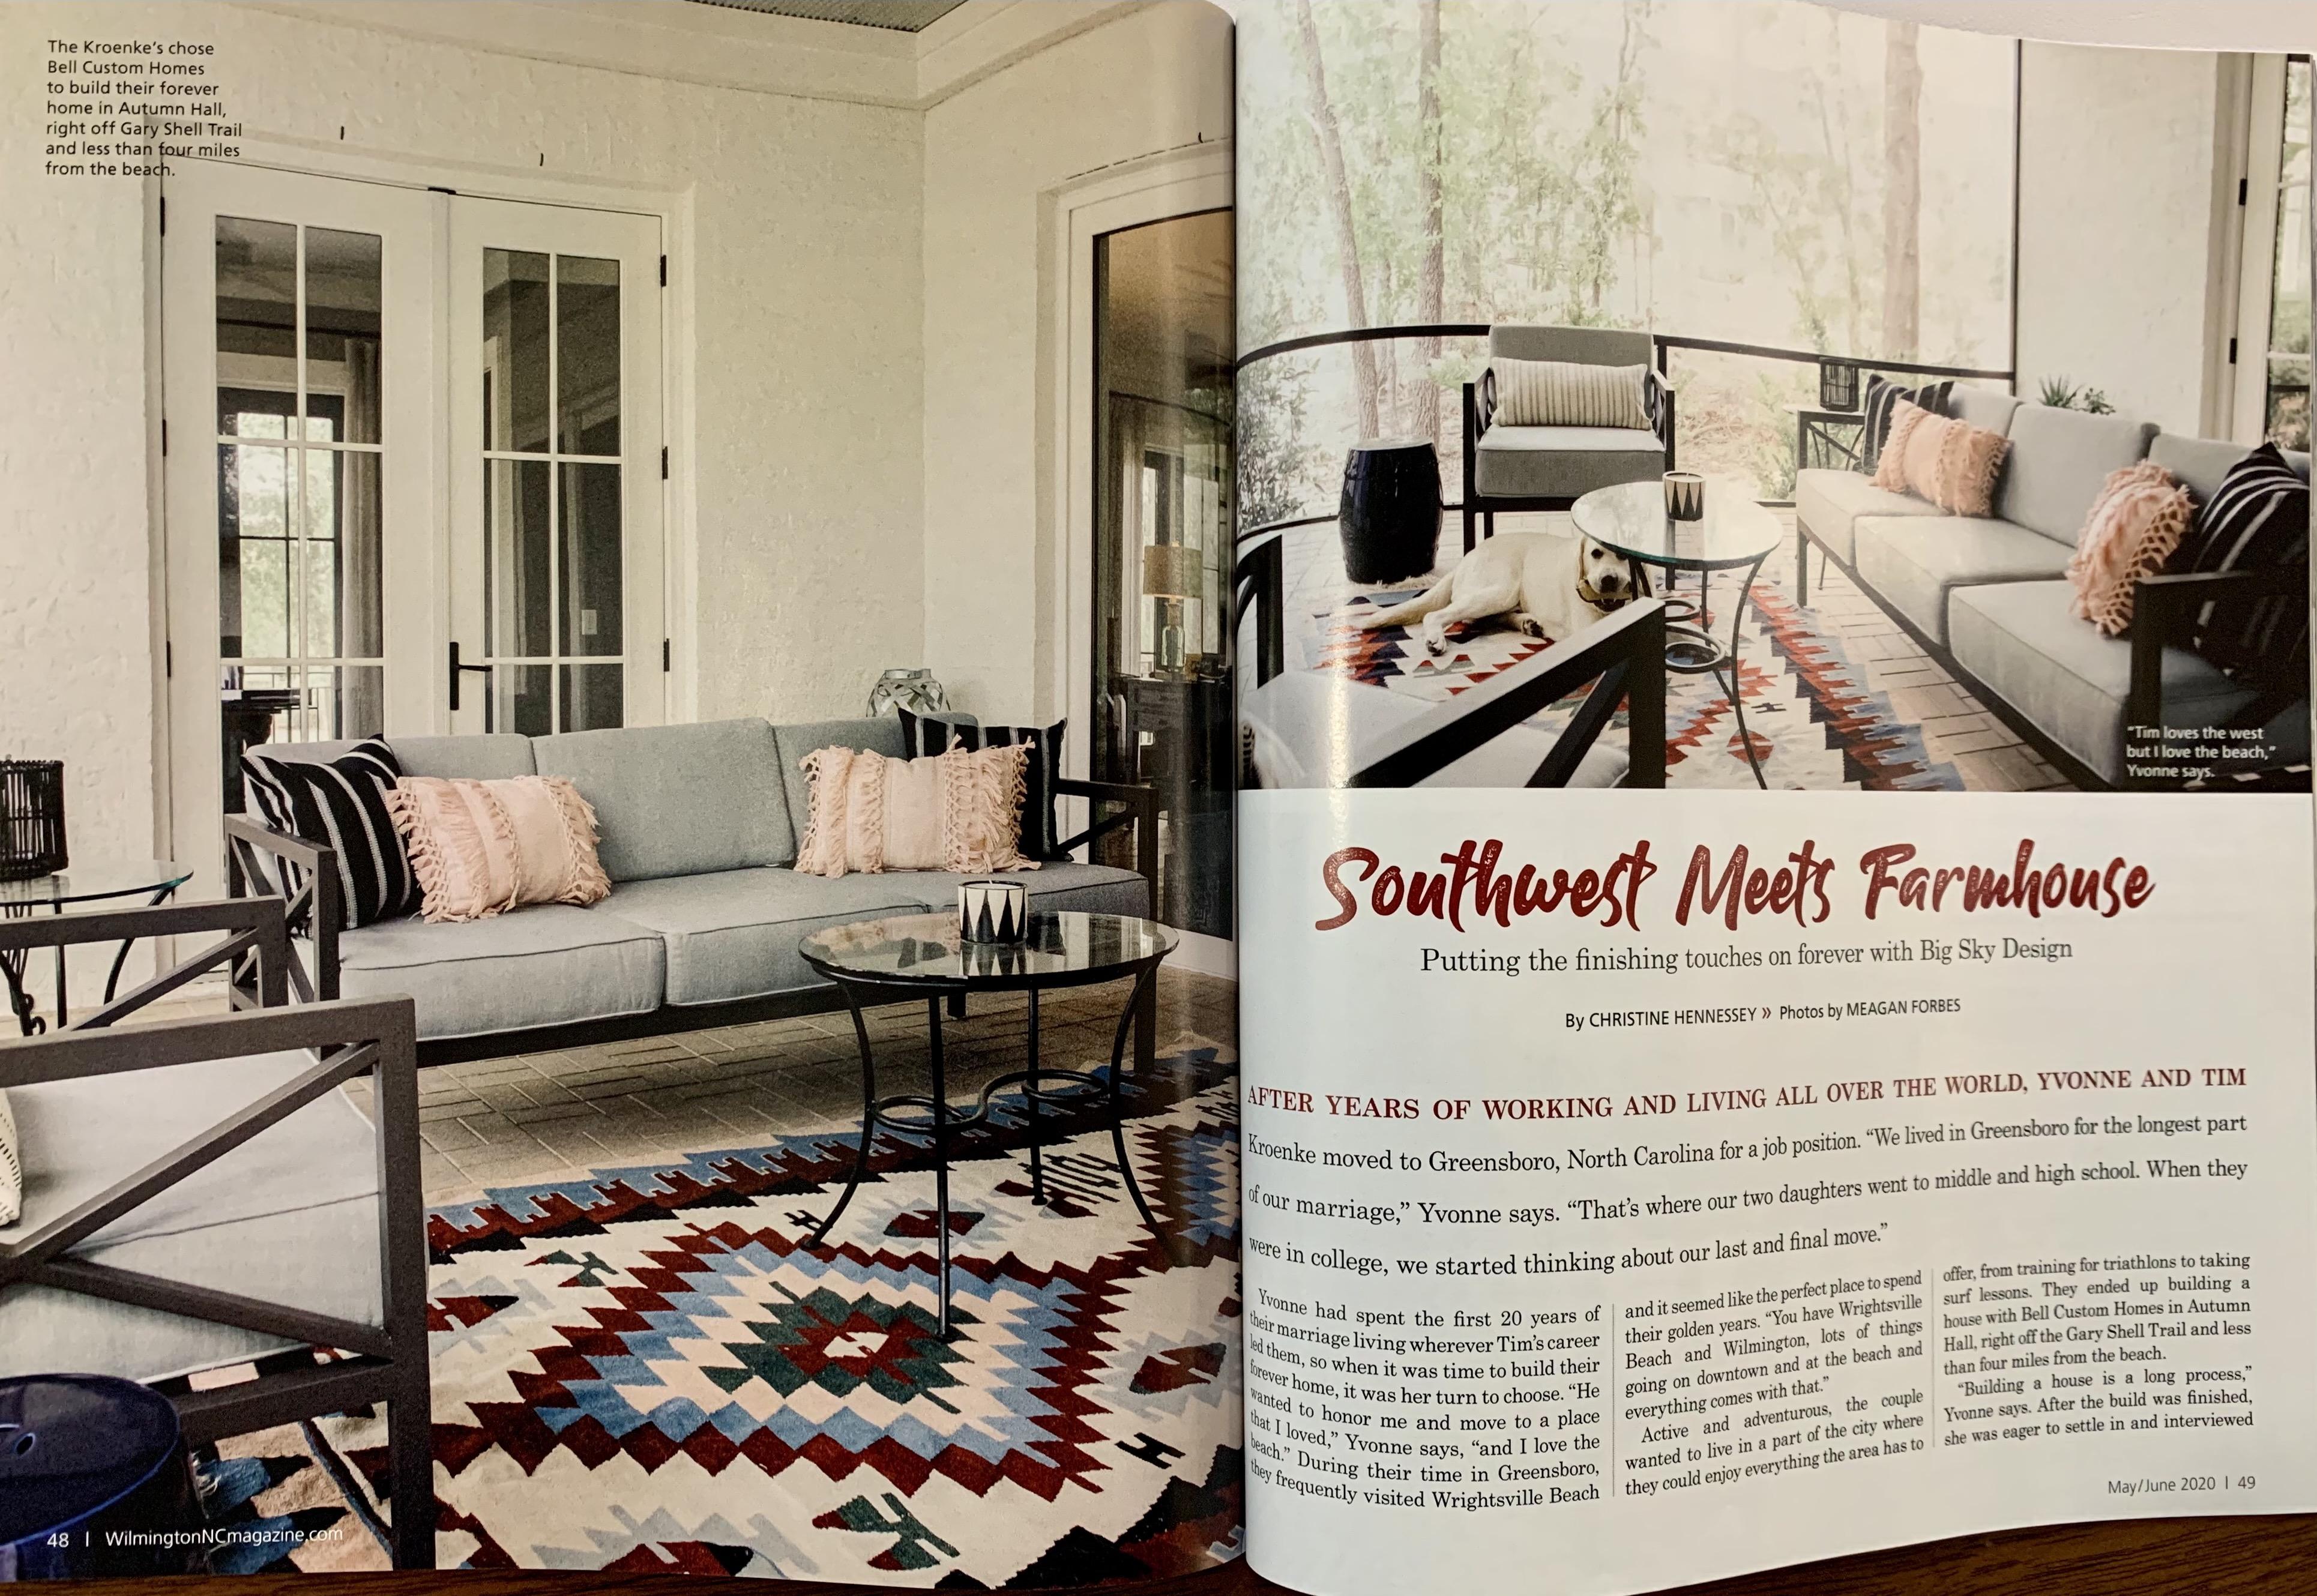 Wilmington Magazine, May/June 2020